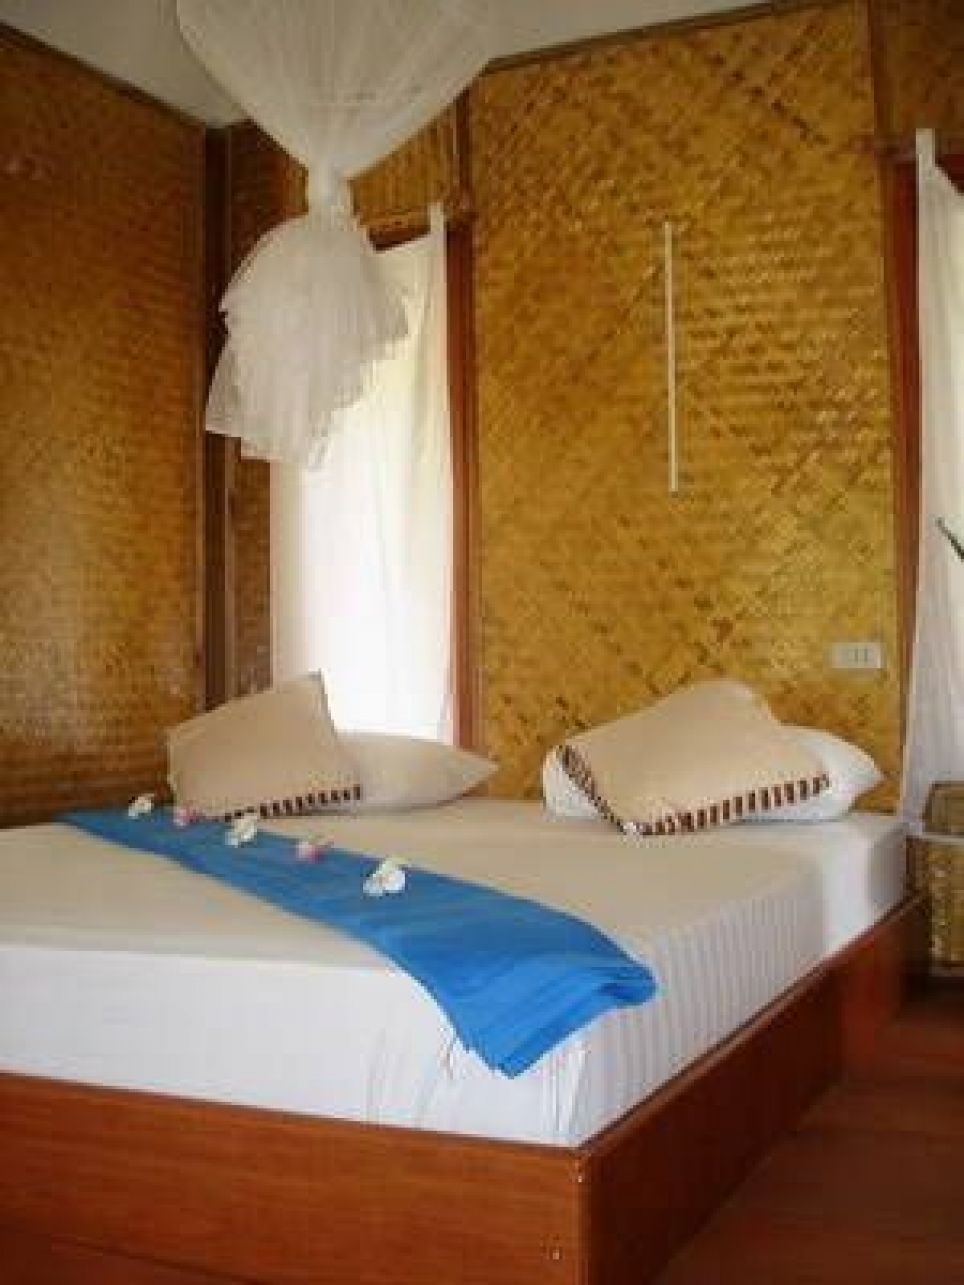 Baan Khao Sok Resort, 231 Moo6, 74000 Ban Sok